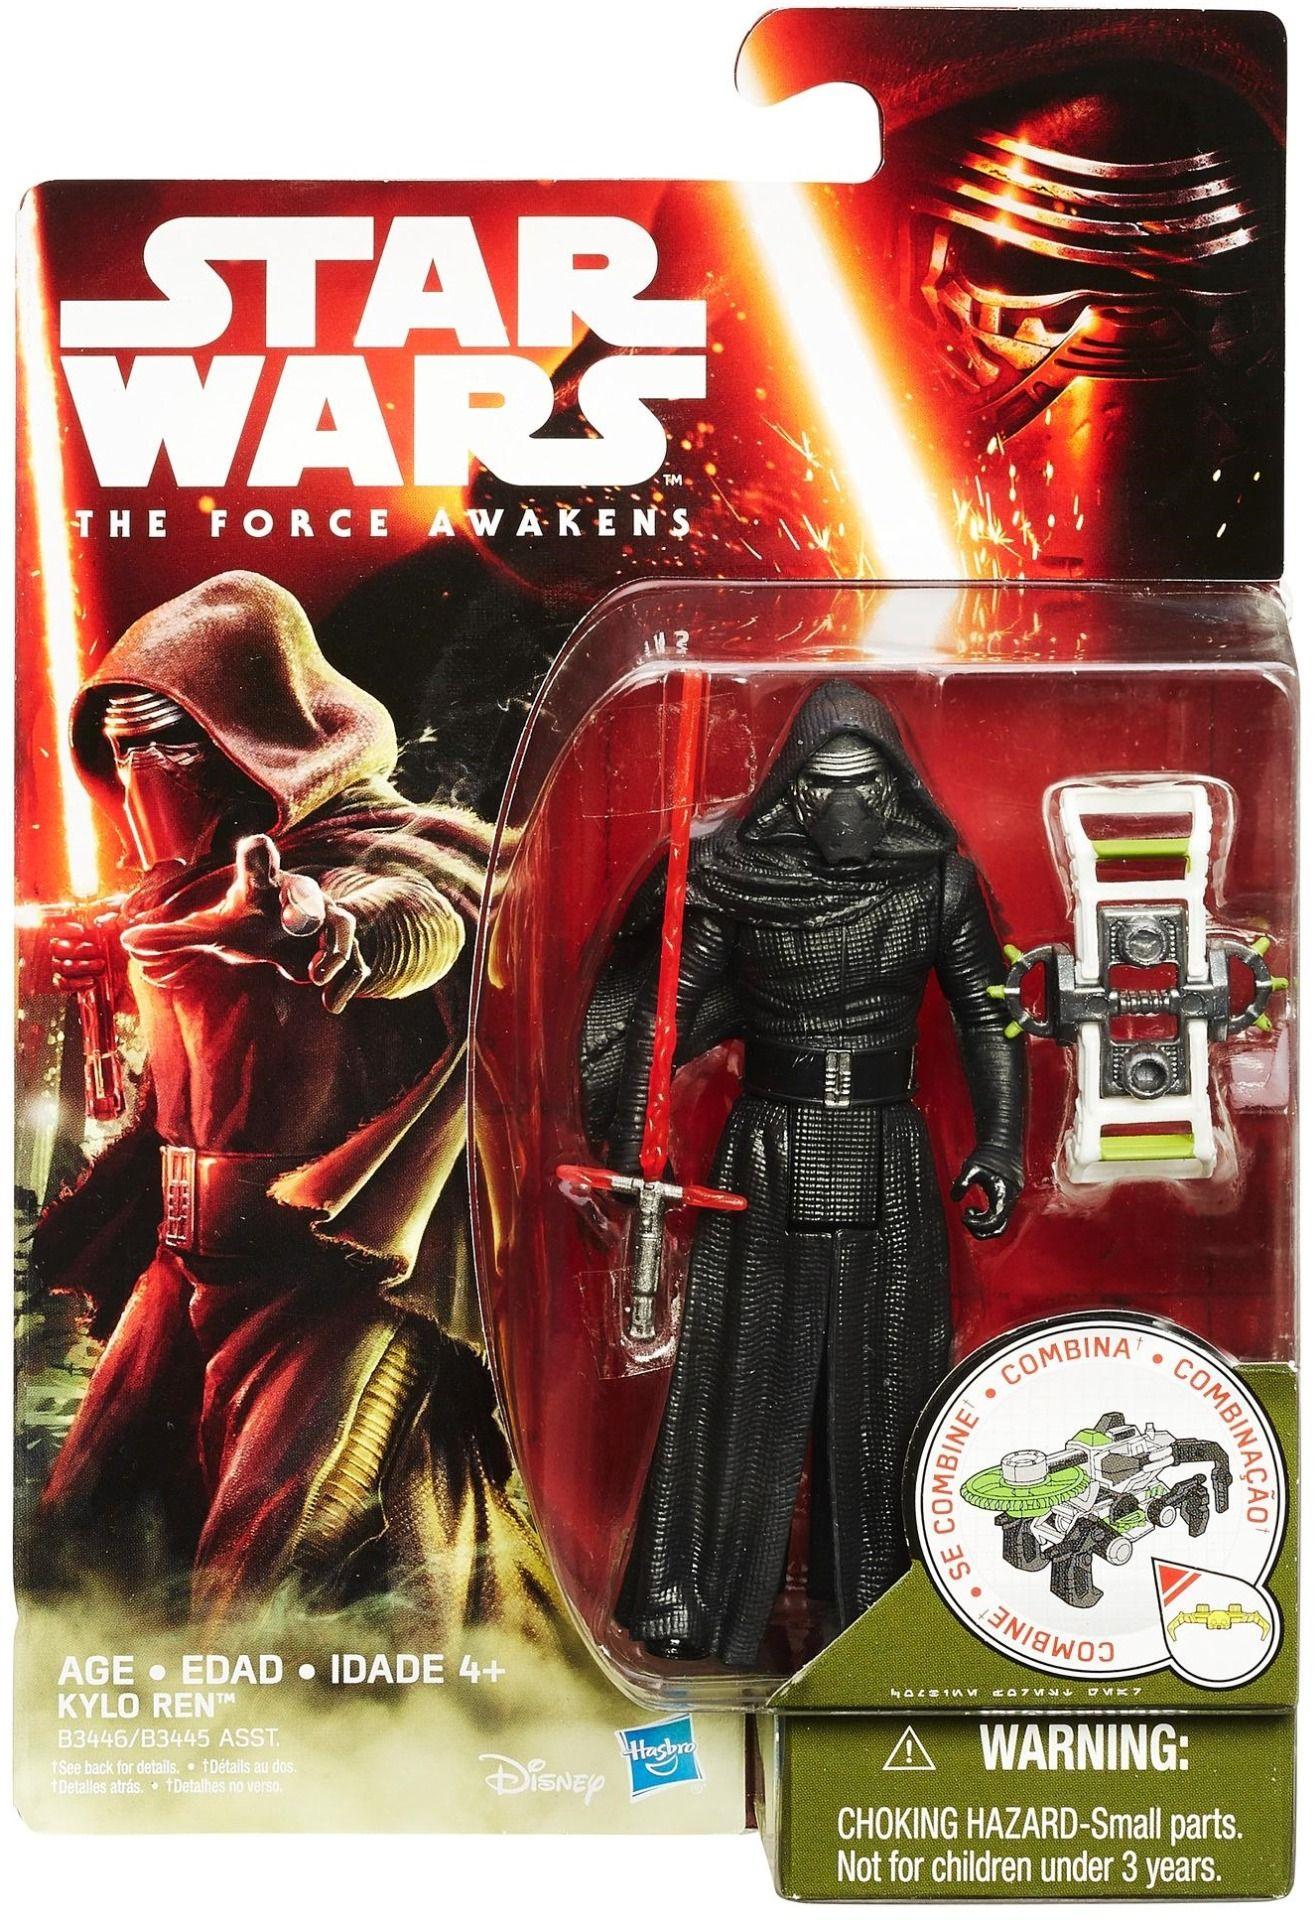 Star Wars Force Awakens Goss Toowers 3.75 Inch Action Figure